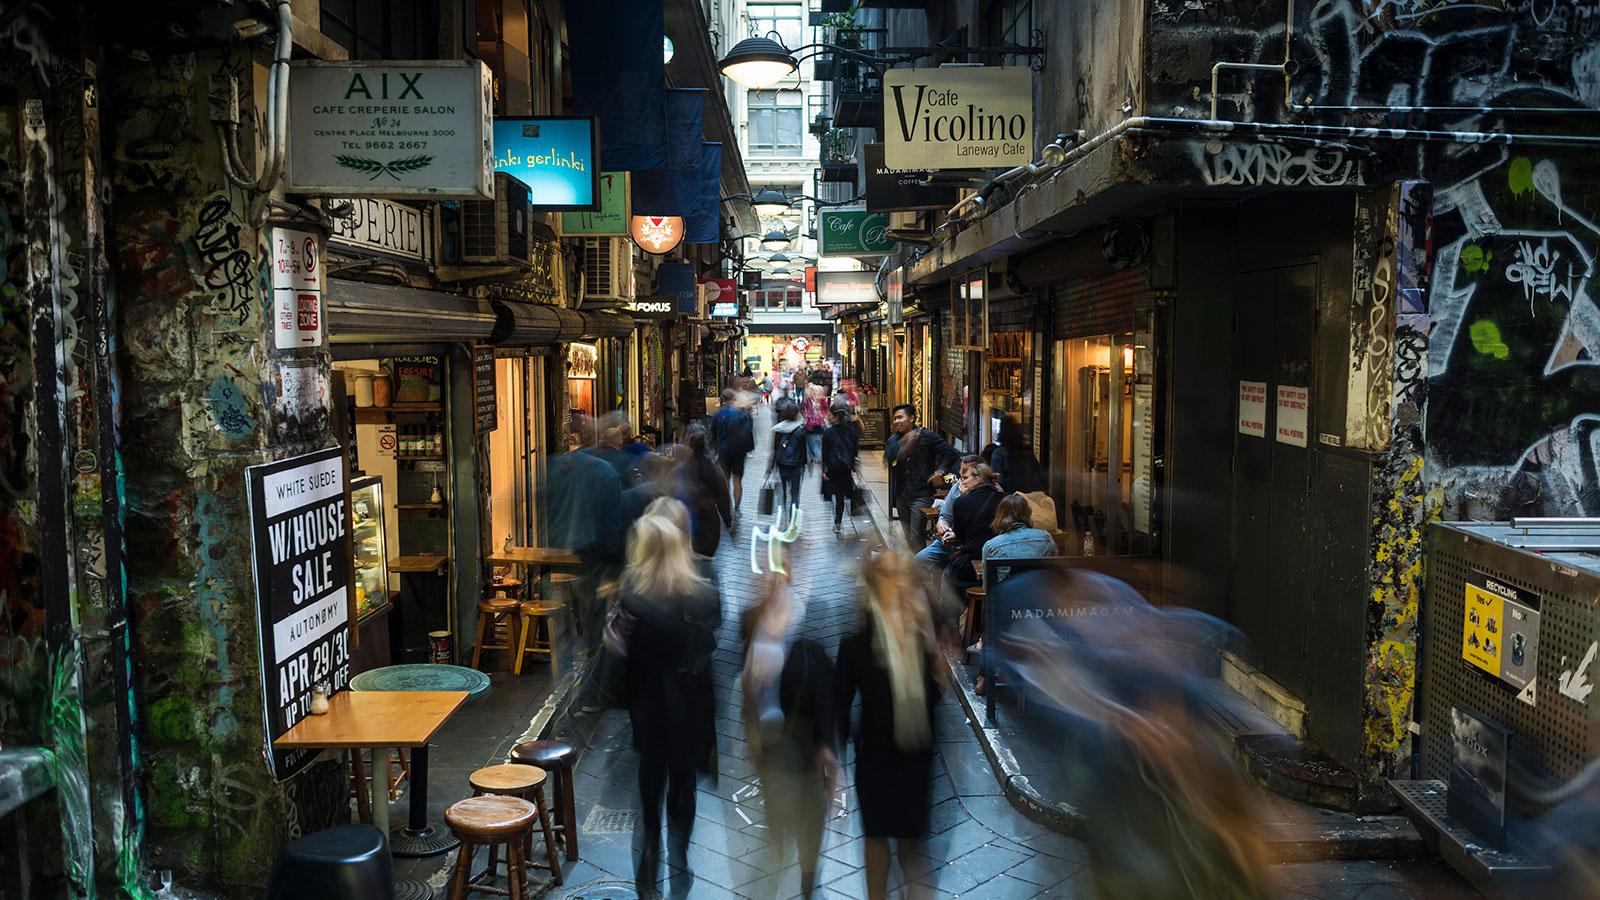 Centre Place, Melbourne, Victoria, Australia. Photo: Robert Blackburn